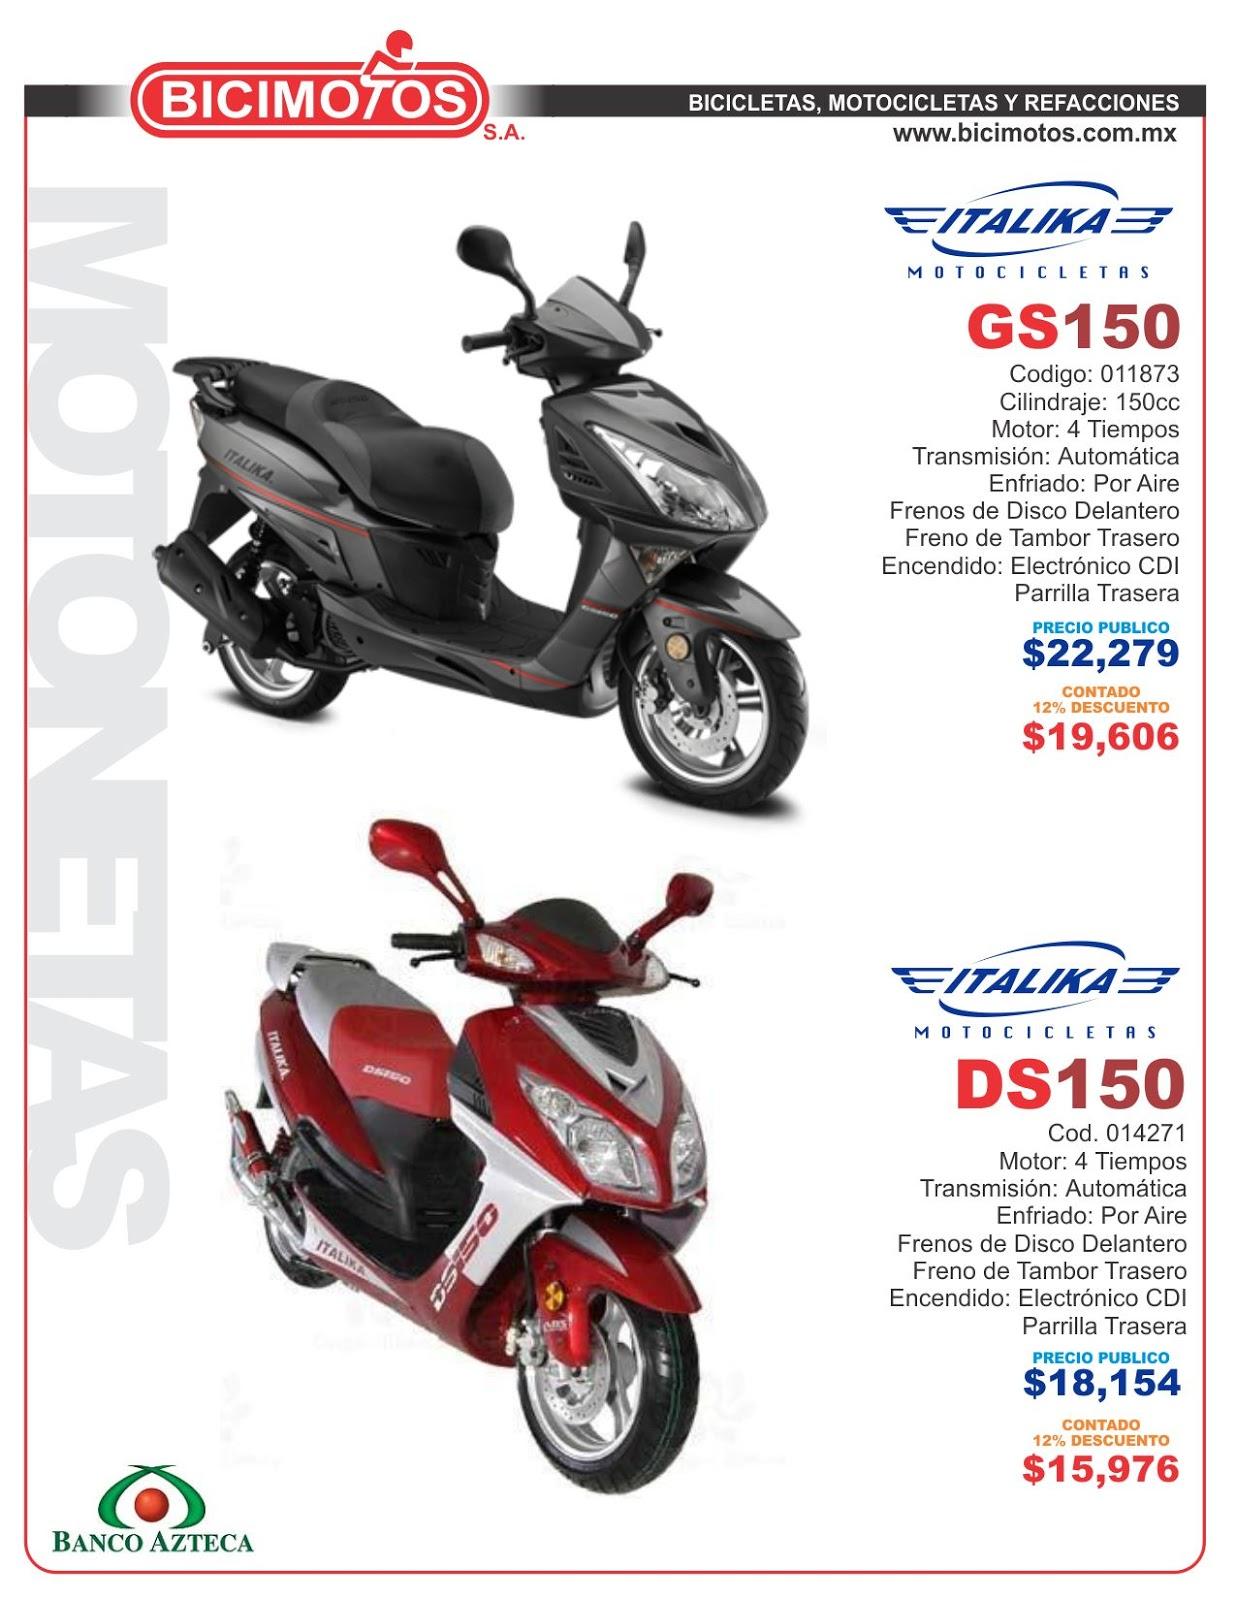 Bicimotos yucatan motocicletas italika 2013 en promocion